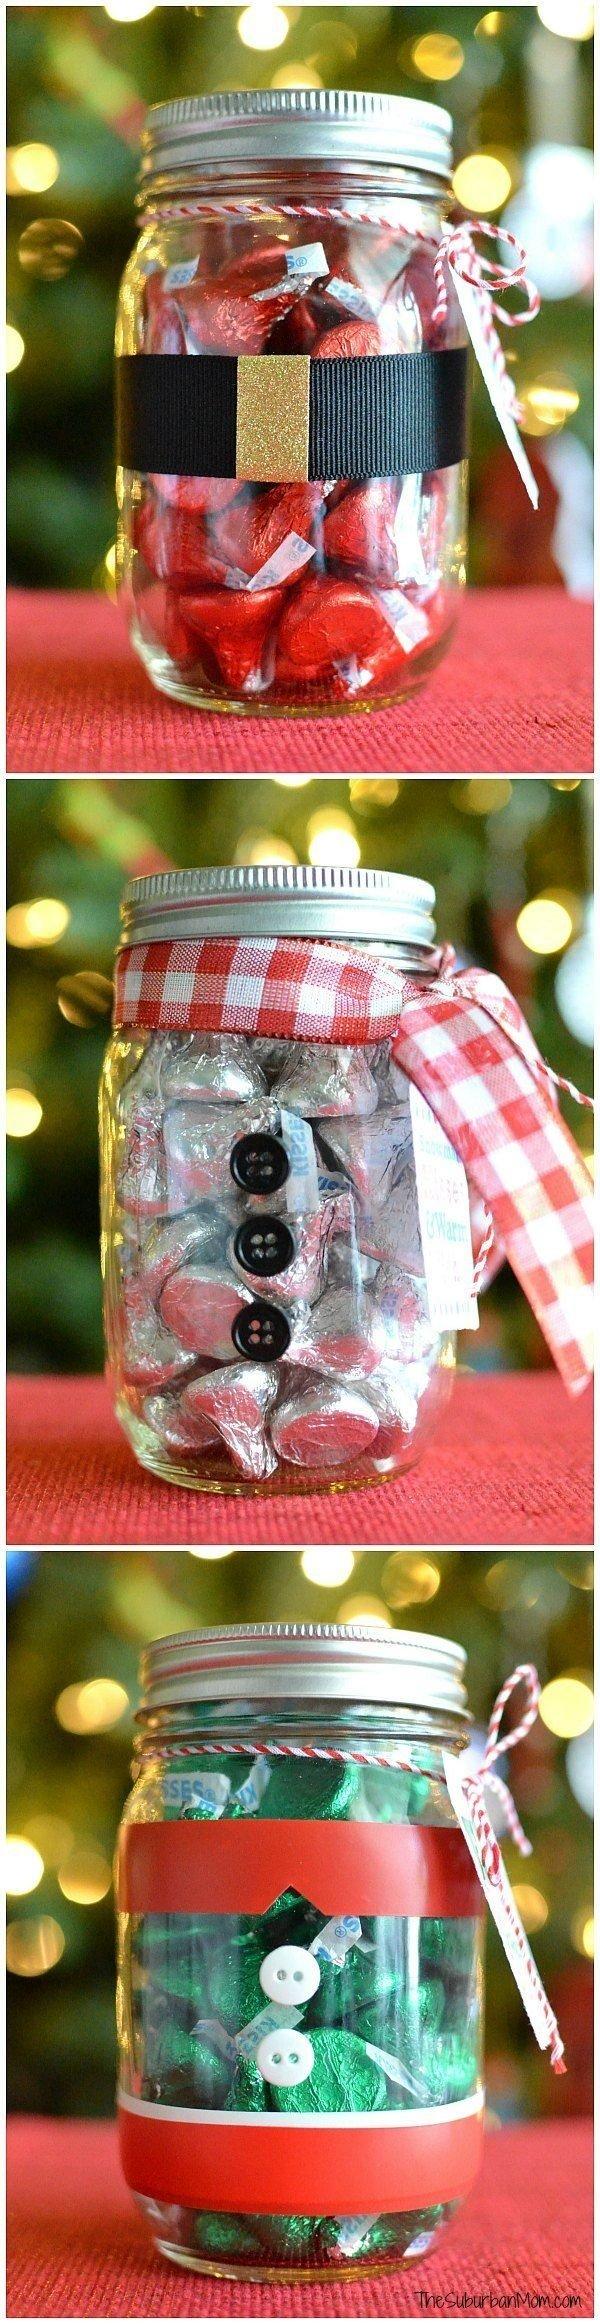 10 Cute Mason Jar Christmas Gift Ideas 742 best mason jar ideas images on pinterest diy presents gift